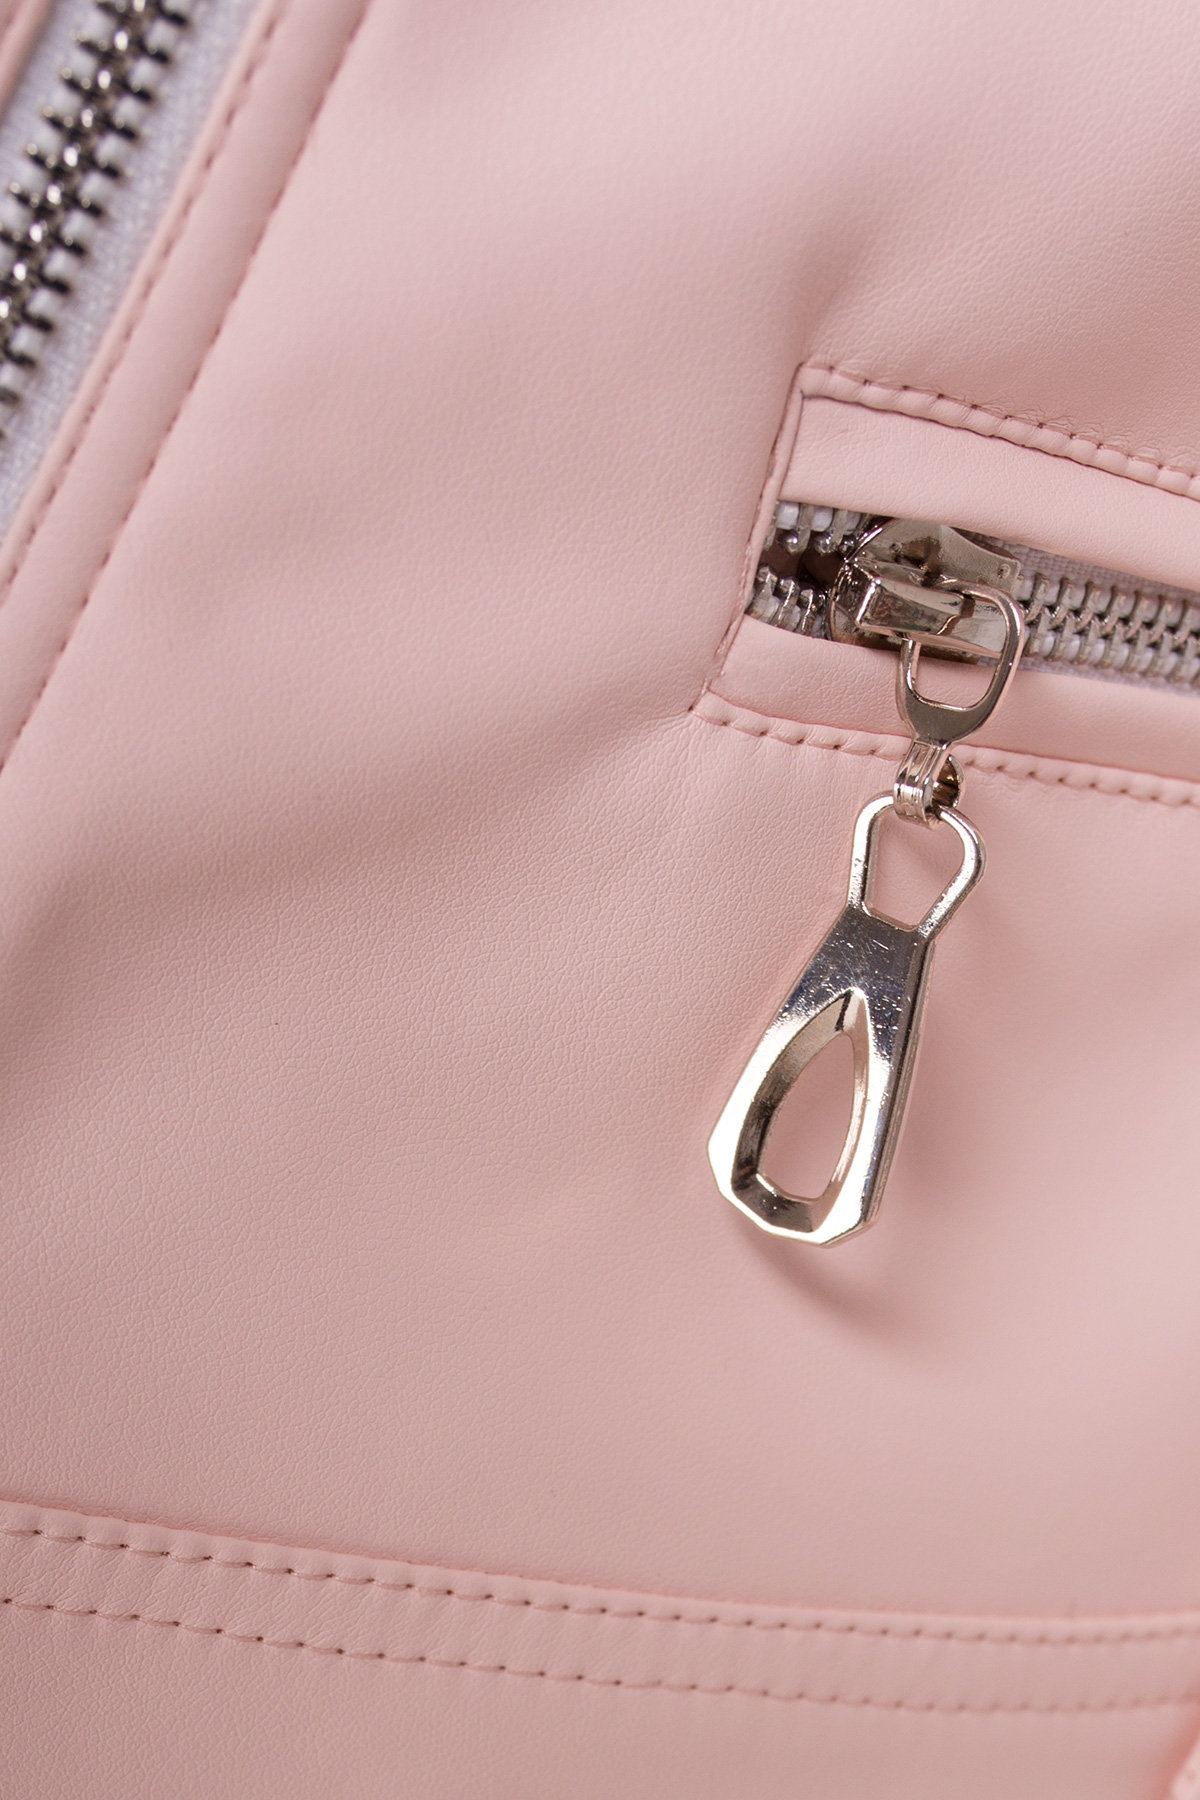 Куртка косуха из эко-кожи Рокер 4832 Цвет: Пудра